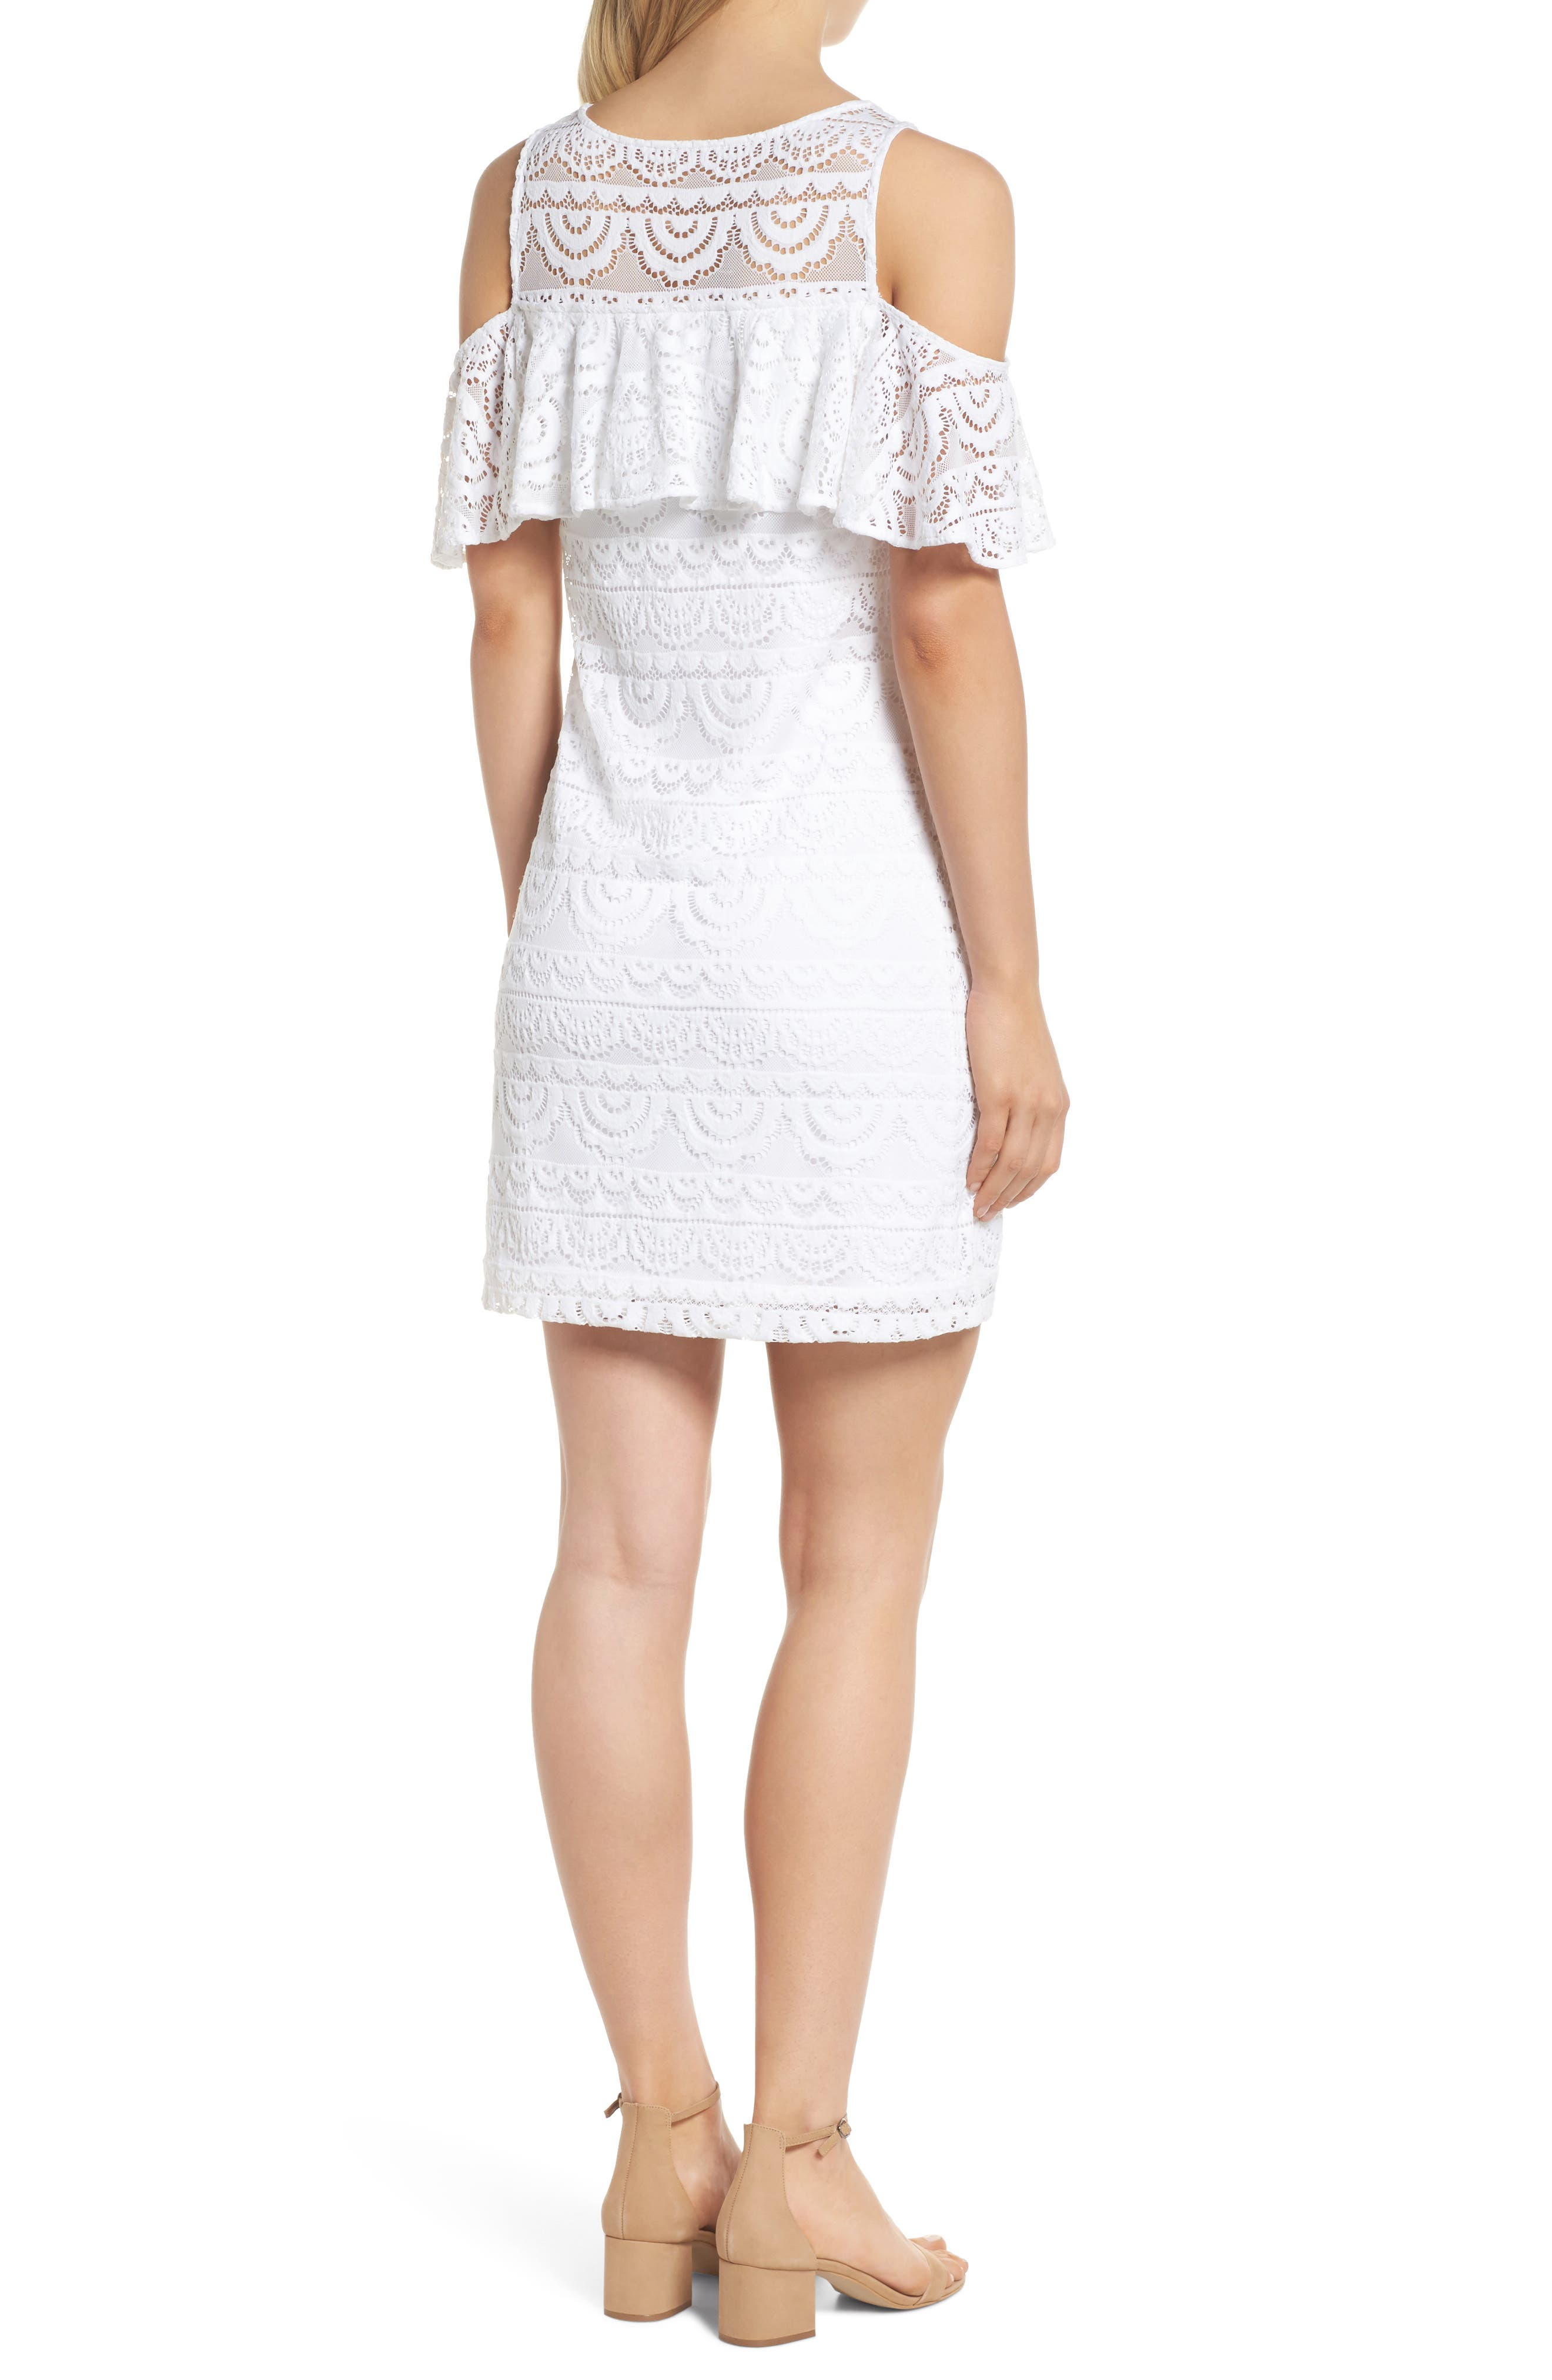 Lyra Cold Shoulder Lace Dress,                             Alternate thumbnail 2, color,                             RESORT WHITE SCALLOP LACE